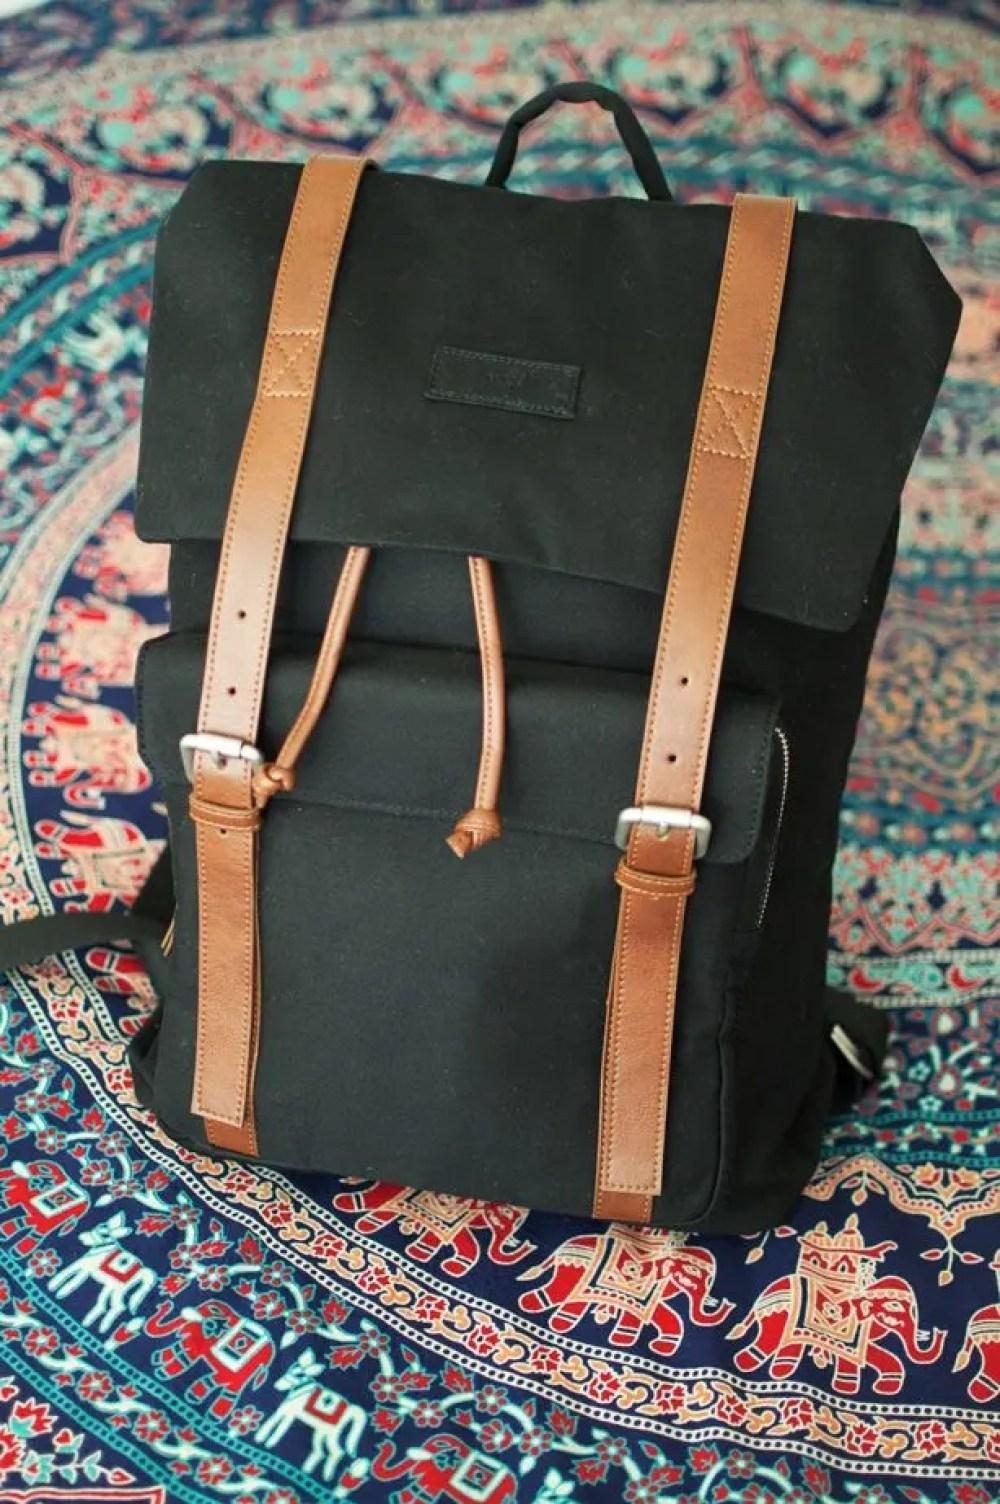 best vegan backpack - Will's Vegan Shoes